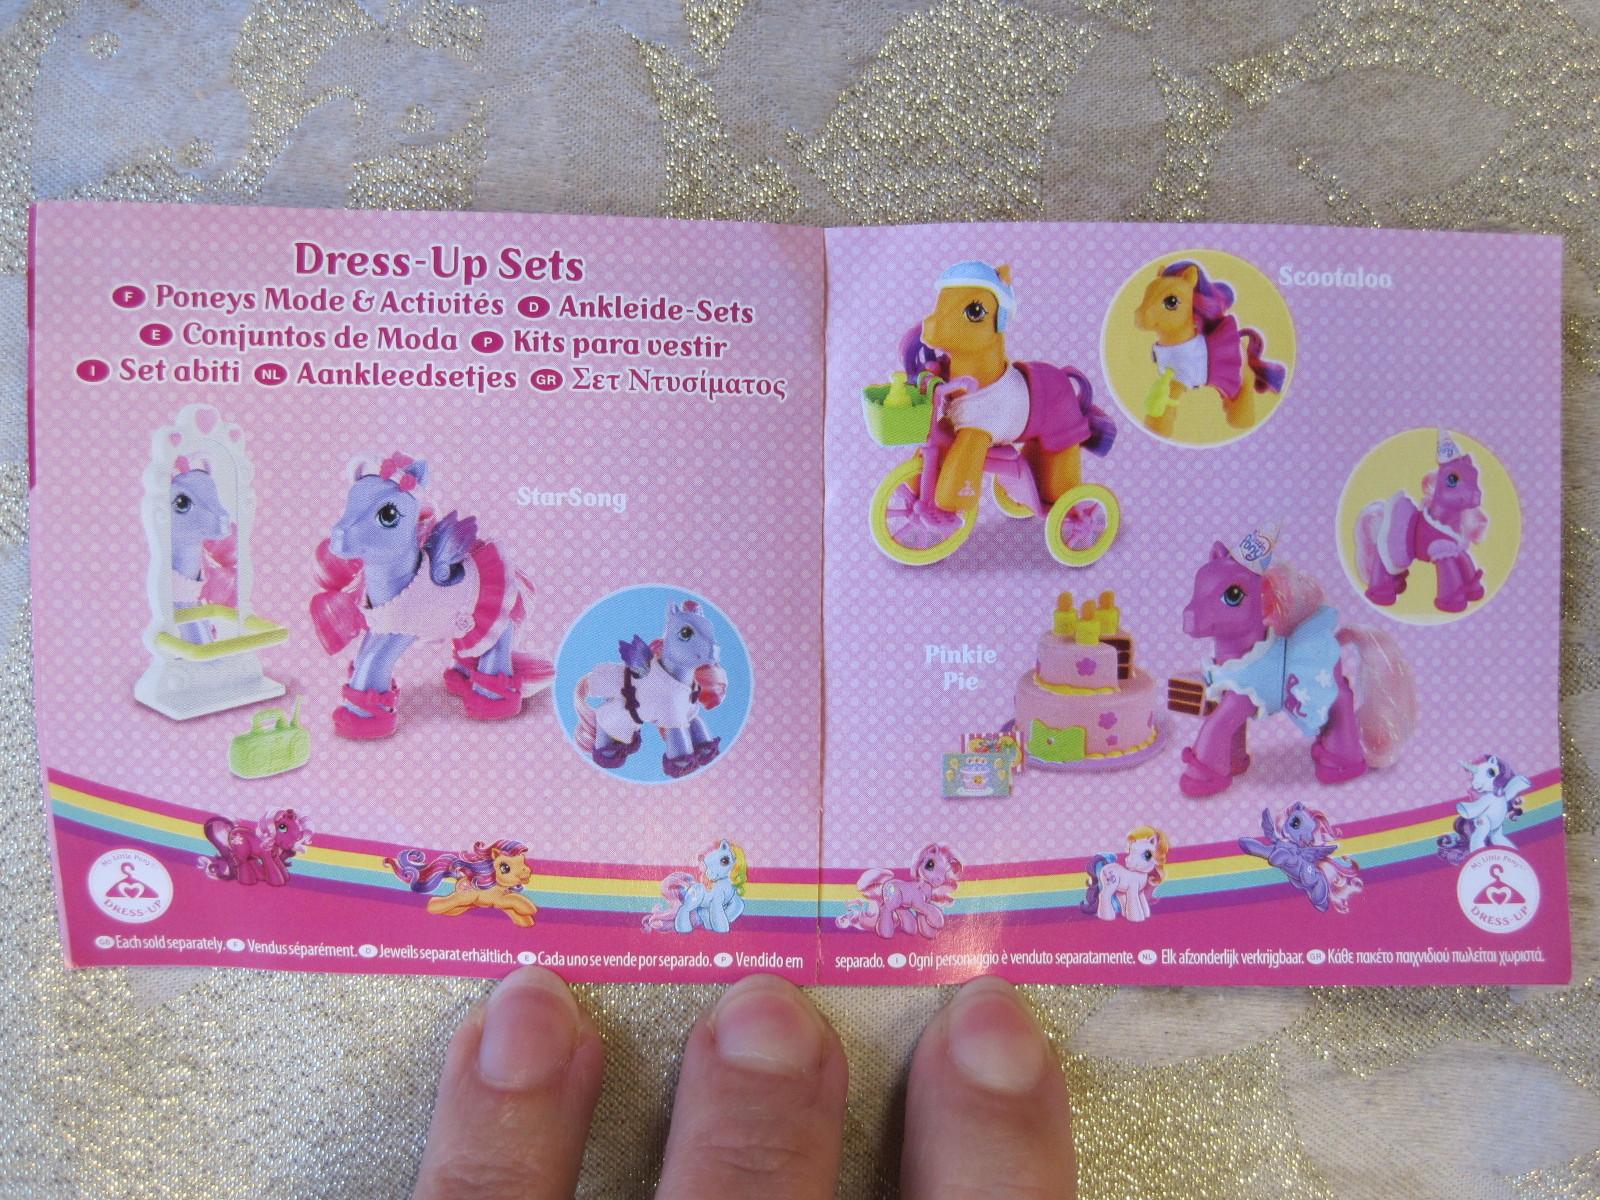 mes petits poneys g3 - Page 5 Img_9397